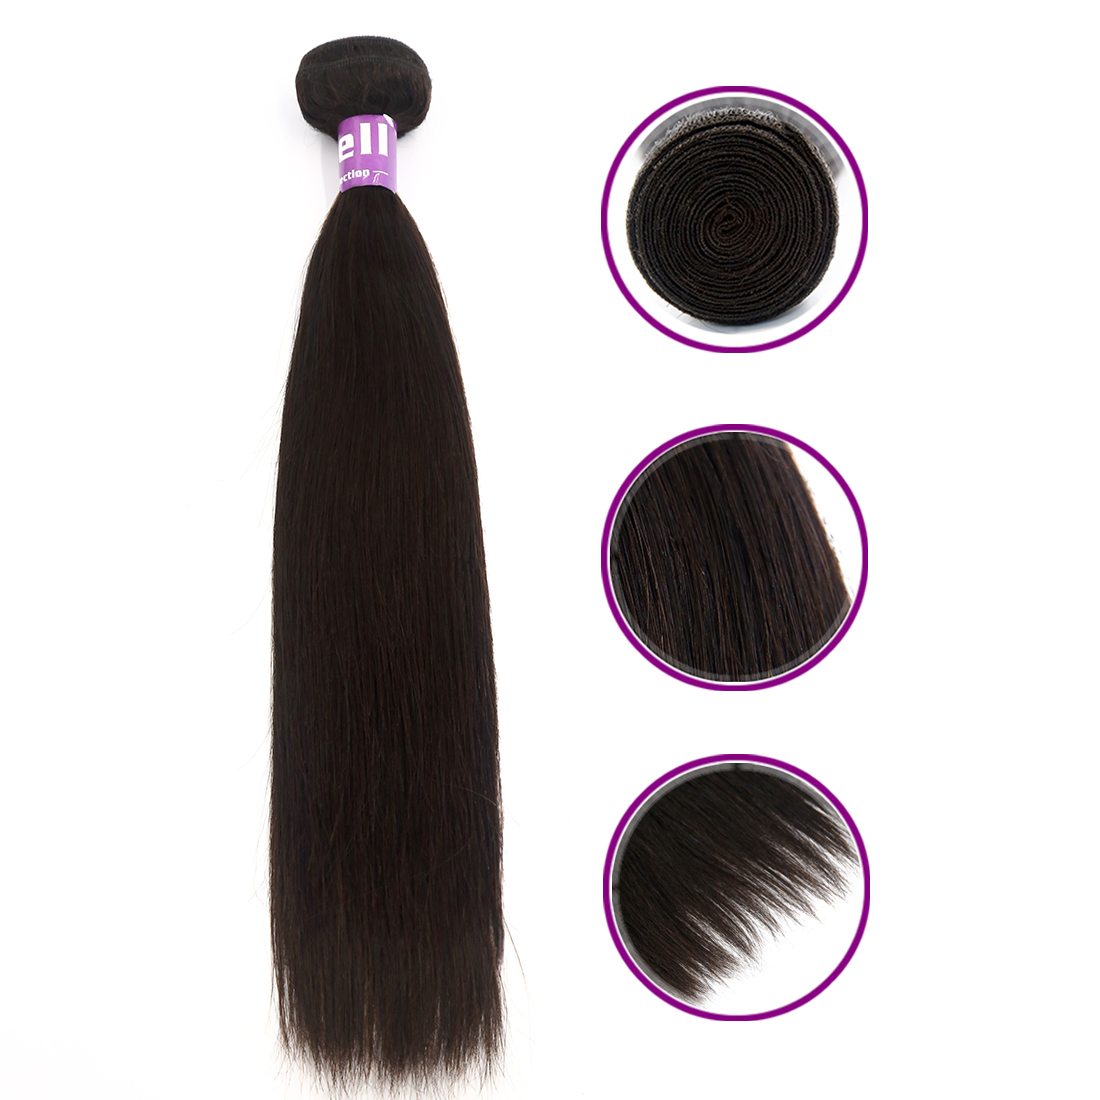 "Human Hair Brazilian Human Hair Straight 12""-30"" 1 / 3 Bundles 8A Unprocessed Peruvian Remy Silky Hair Extensions"